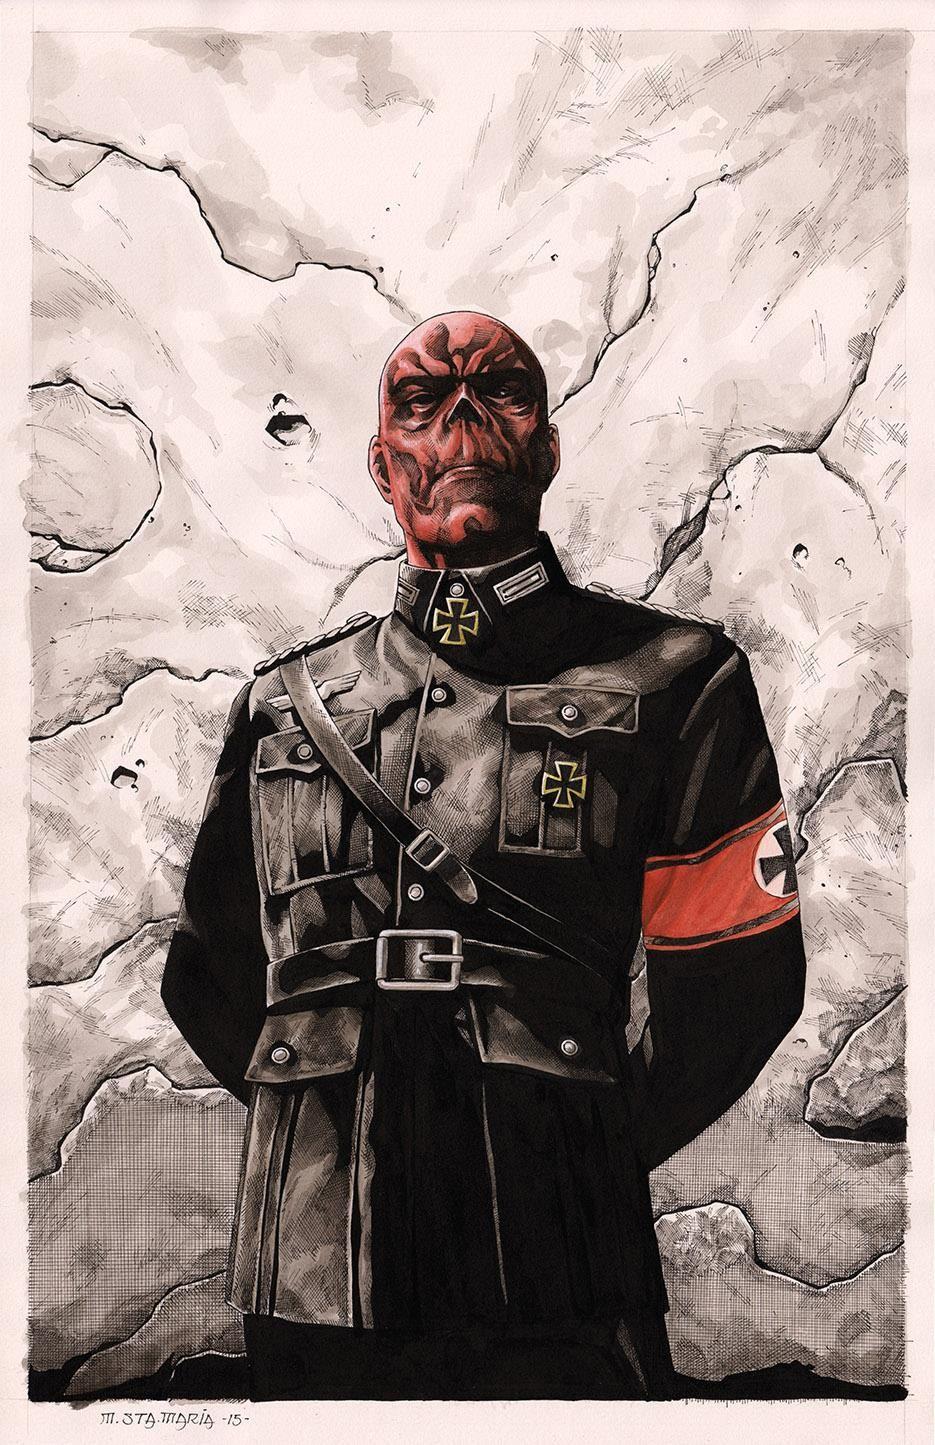 Red Skull Marvel Comics Original 11x17 Art Print signed by artist Scott Harben